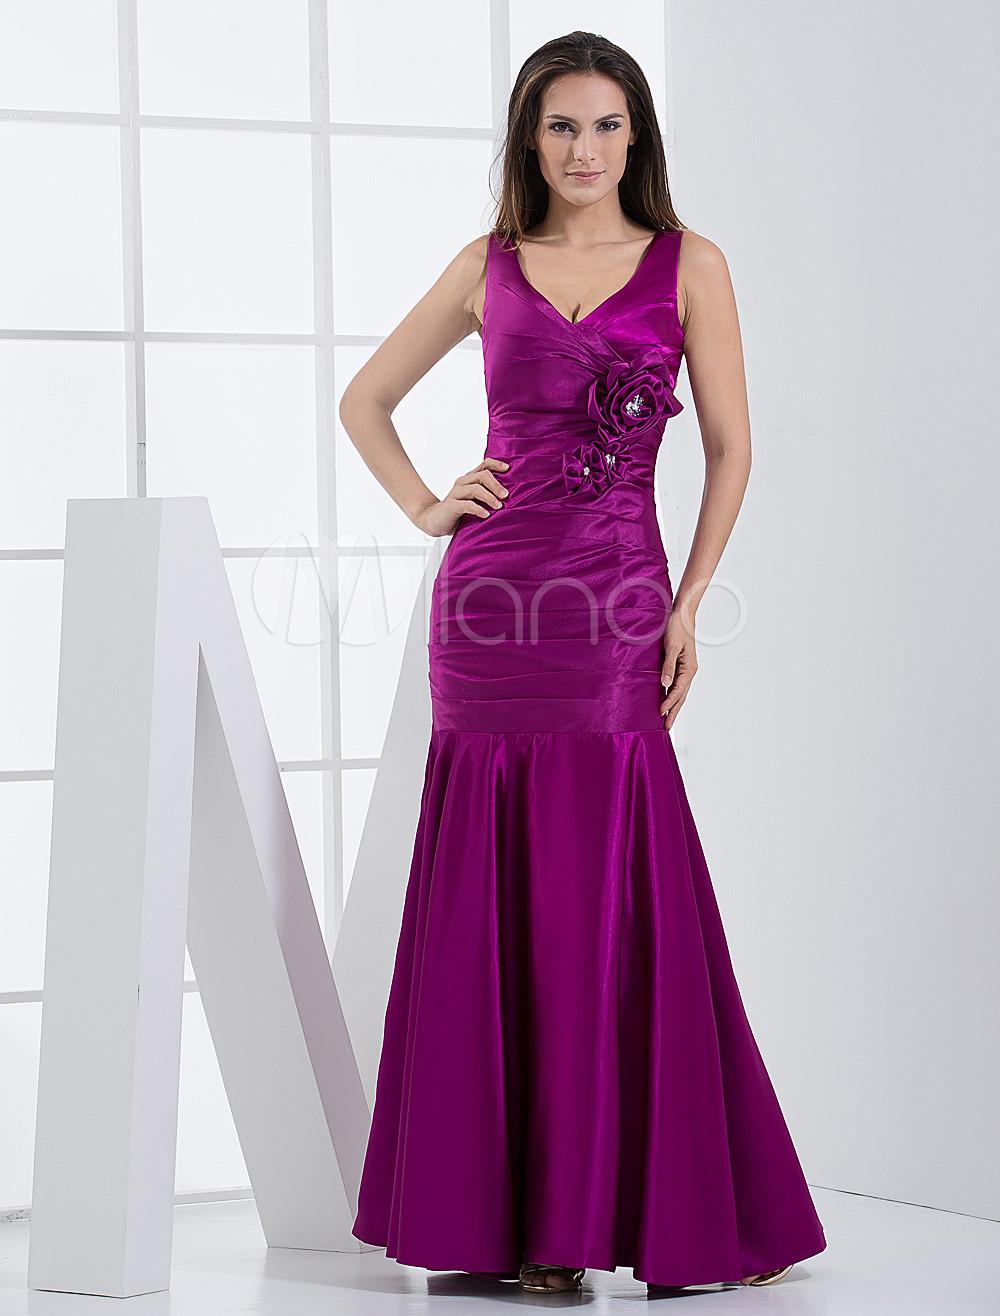 V-Neck Flower Bridesmaid Dress